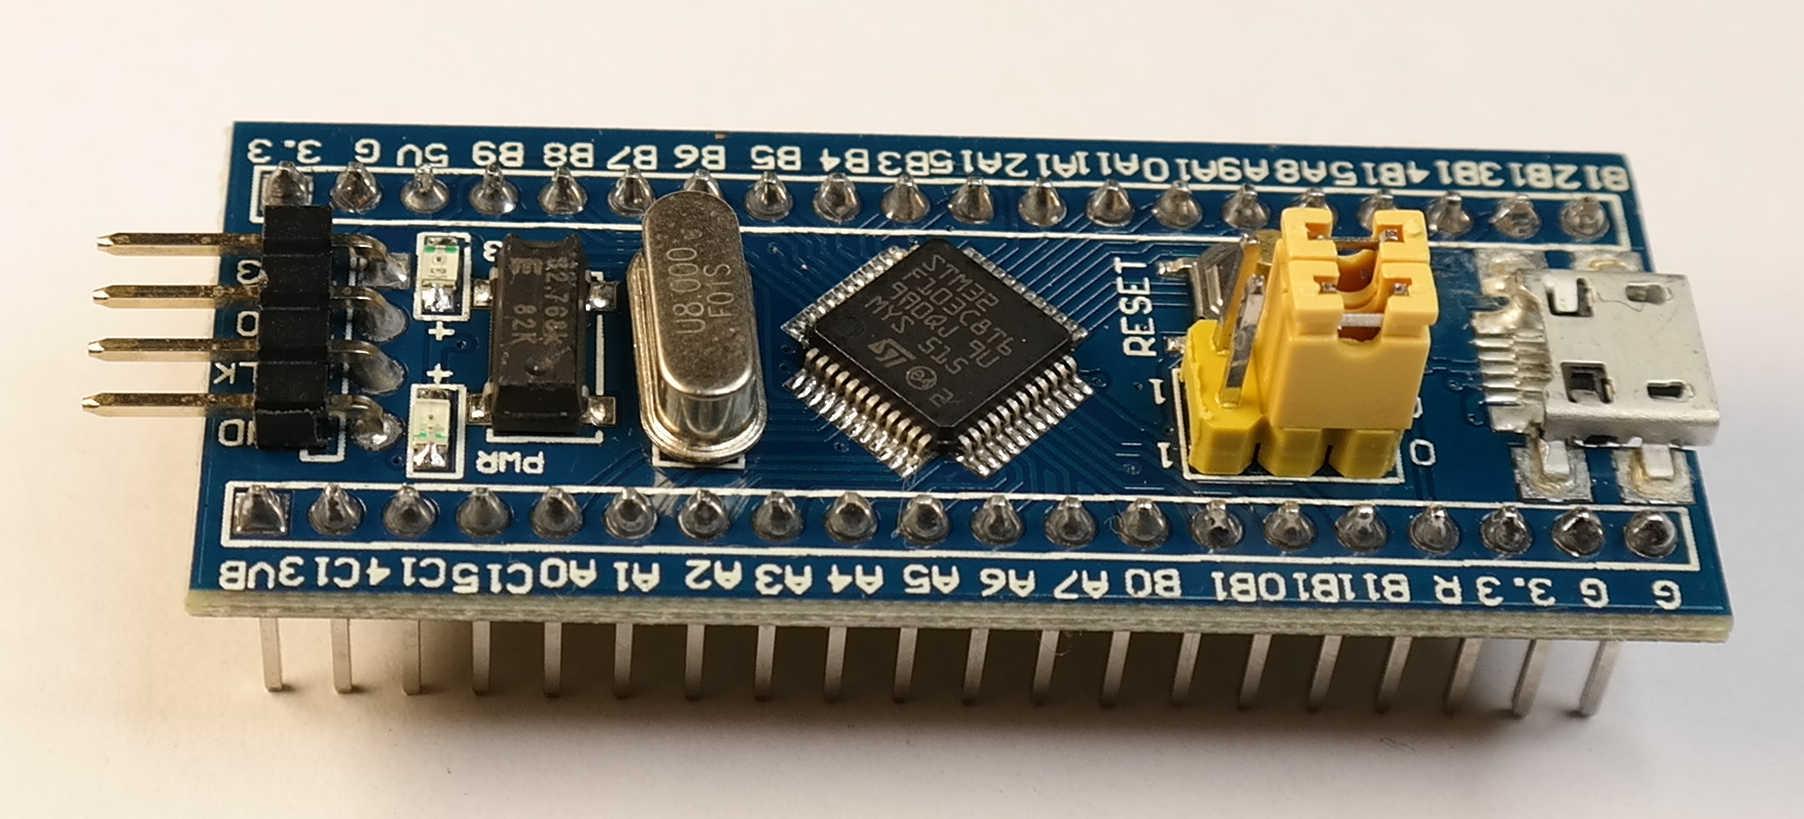 Stm32f103c8t6 Arm Stm32 Minimum System Development Board Module For Preview Image 1